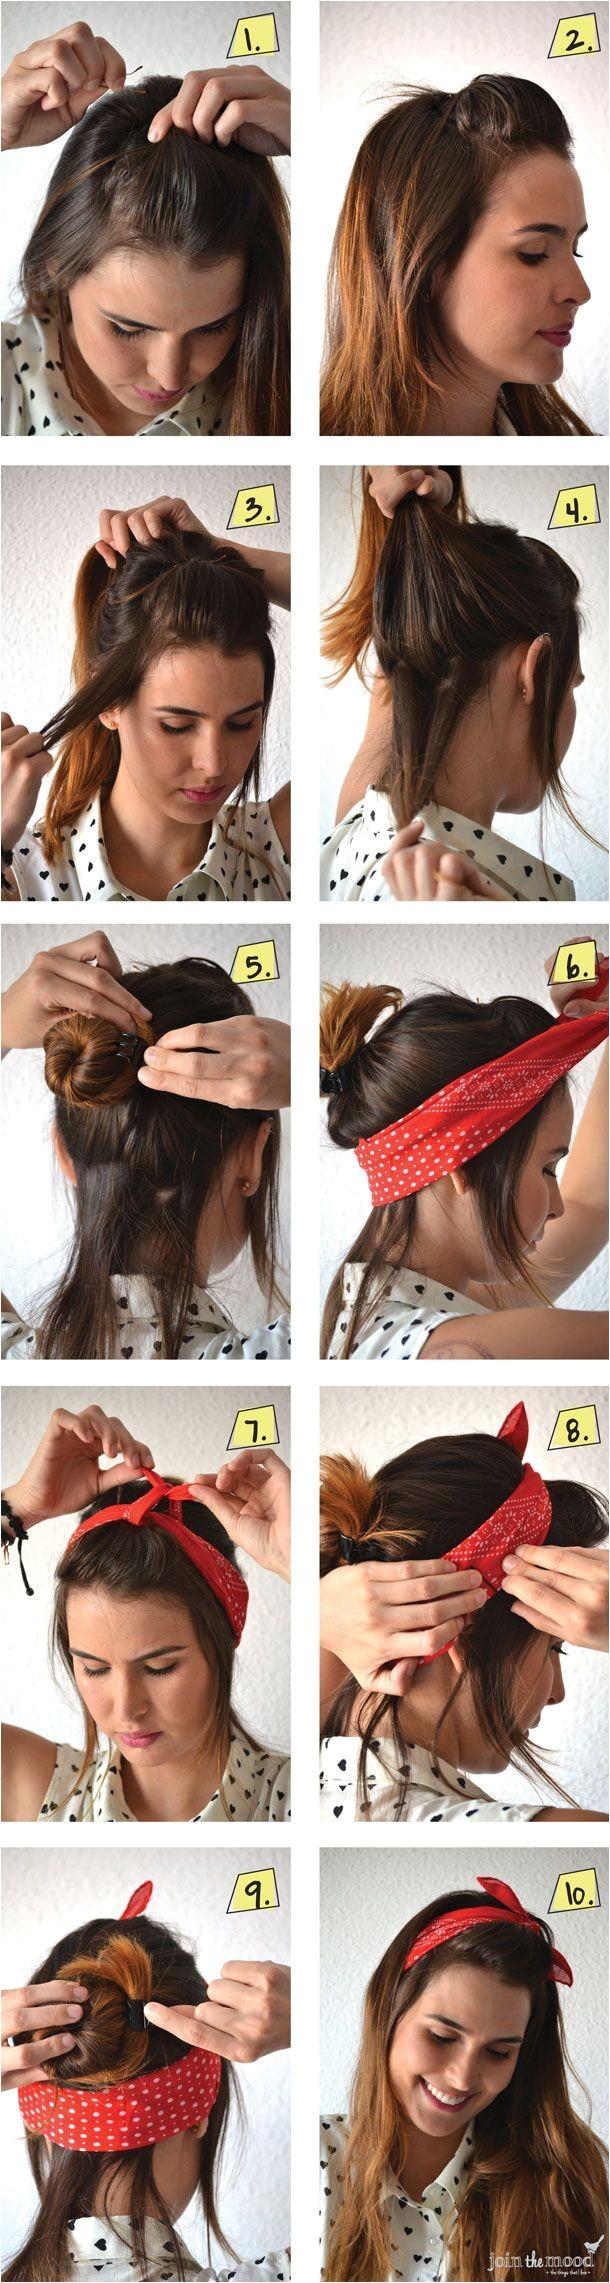 Easy Hairstyles with Bandanas 1000 Ideeën Over Bandana Haar Op Pinterest Bandana Haar